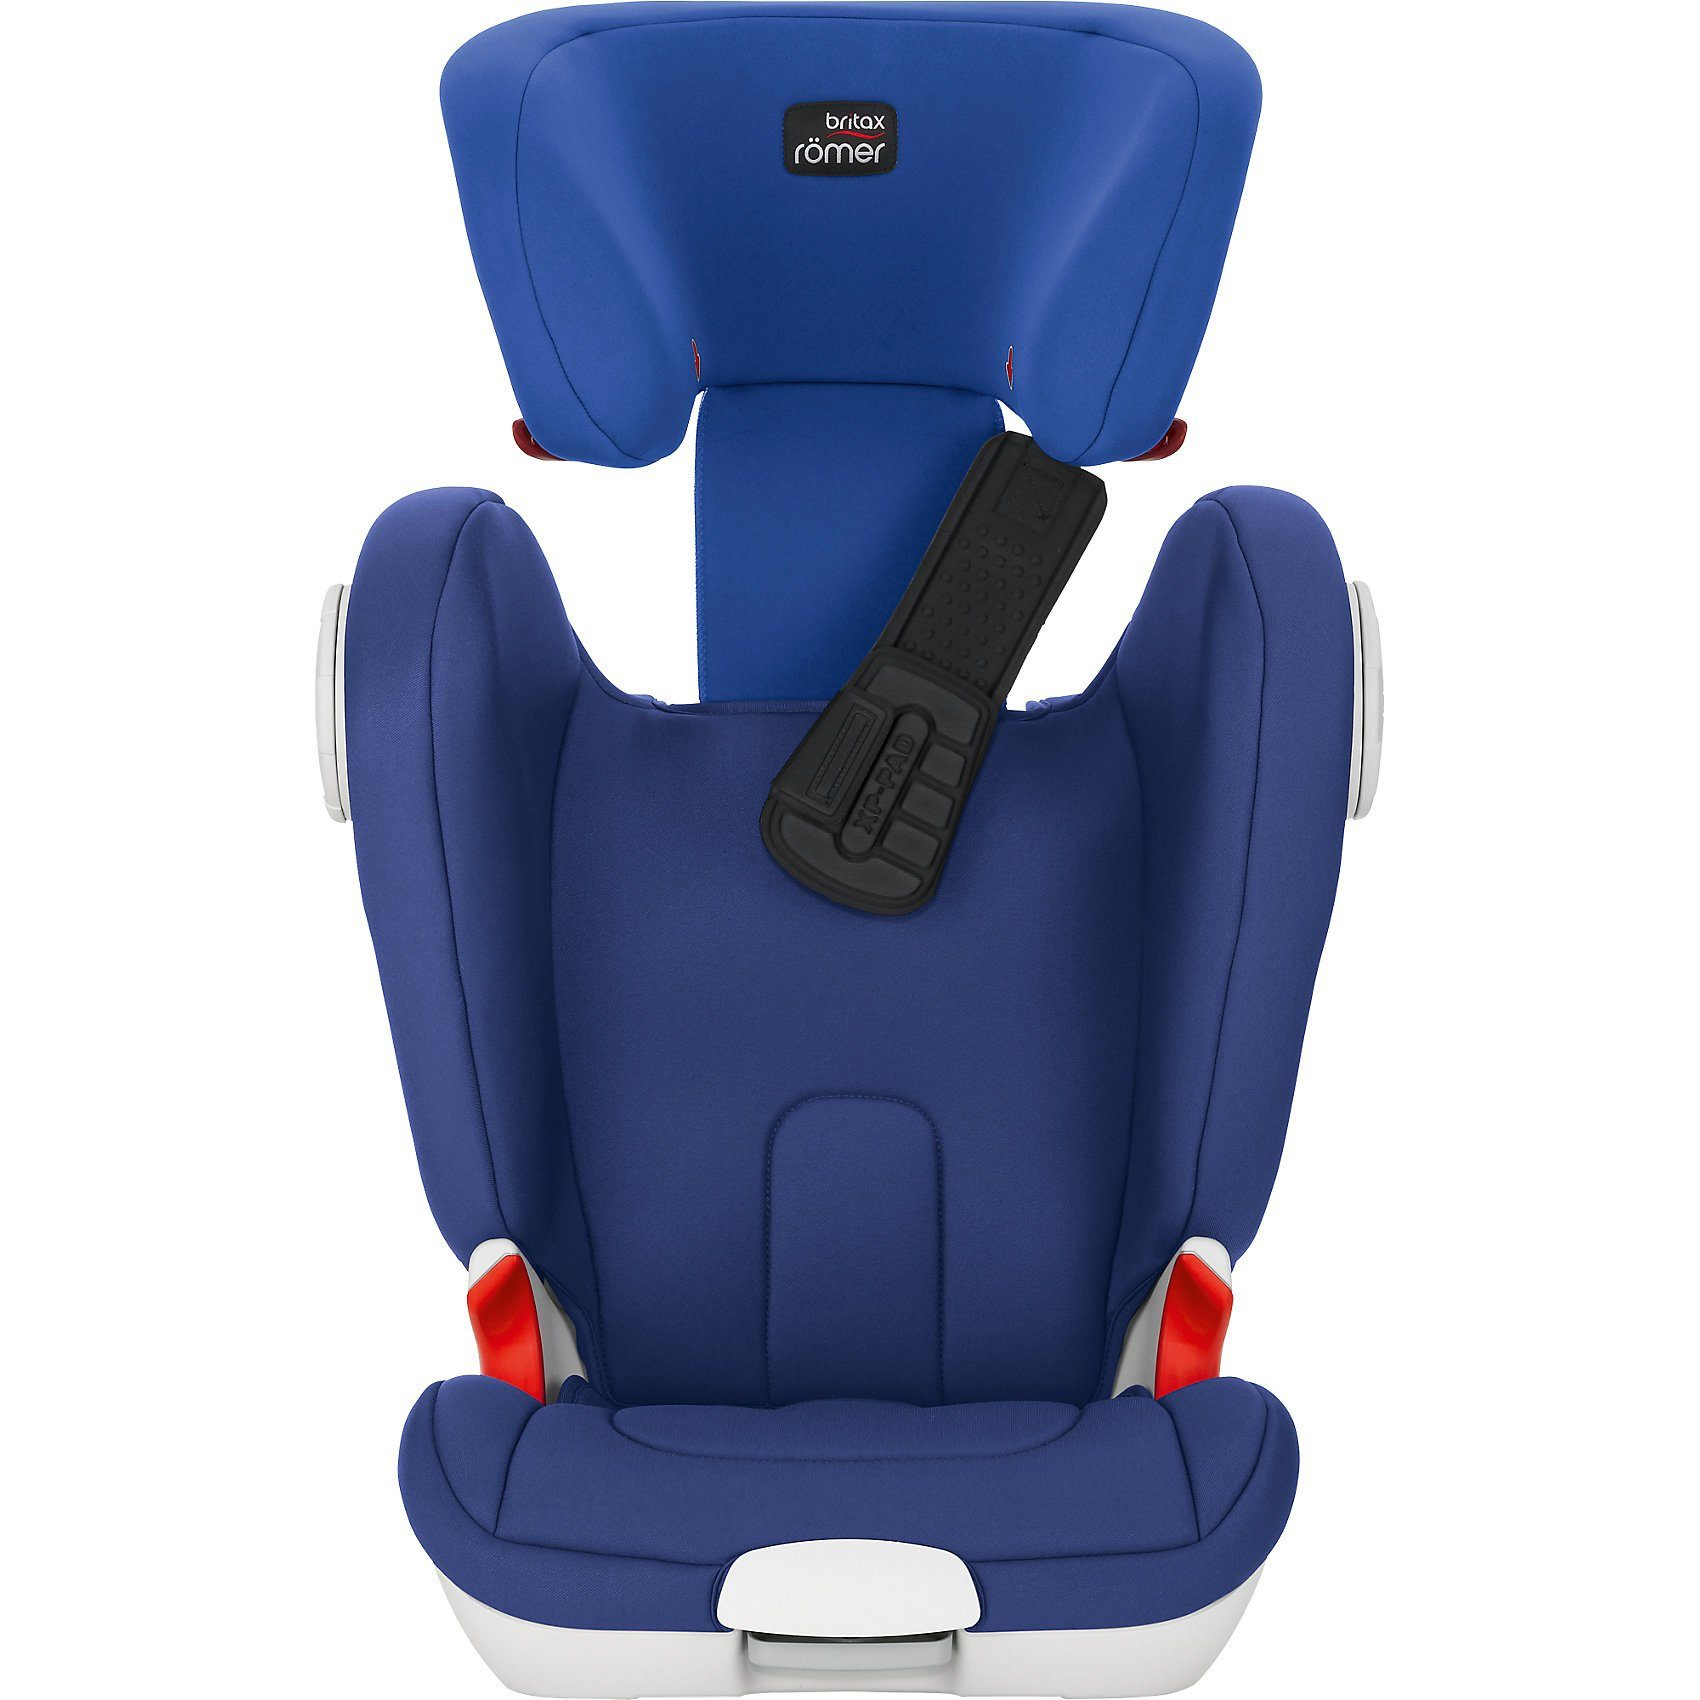 BRITAX RÖMER Auto-Kindersitz Kidfix XP Sict, Ocean Blue, 2018